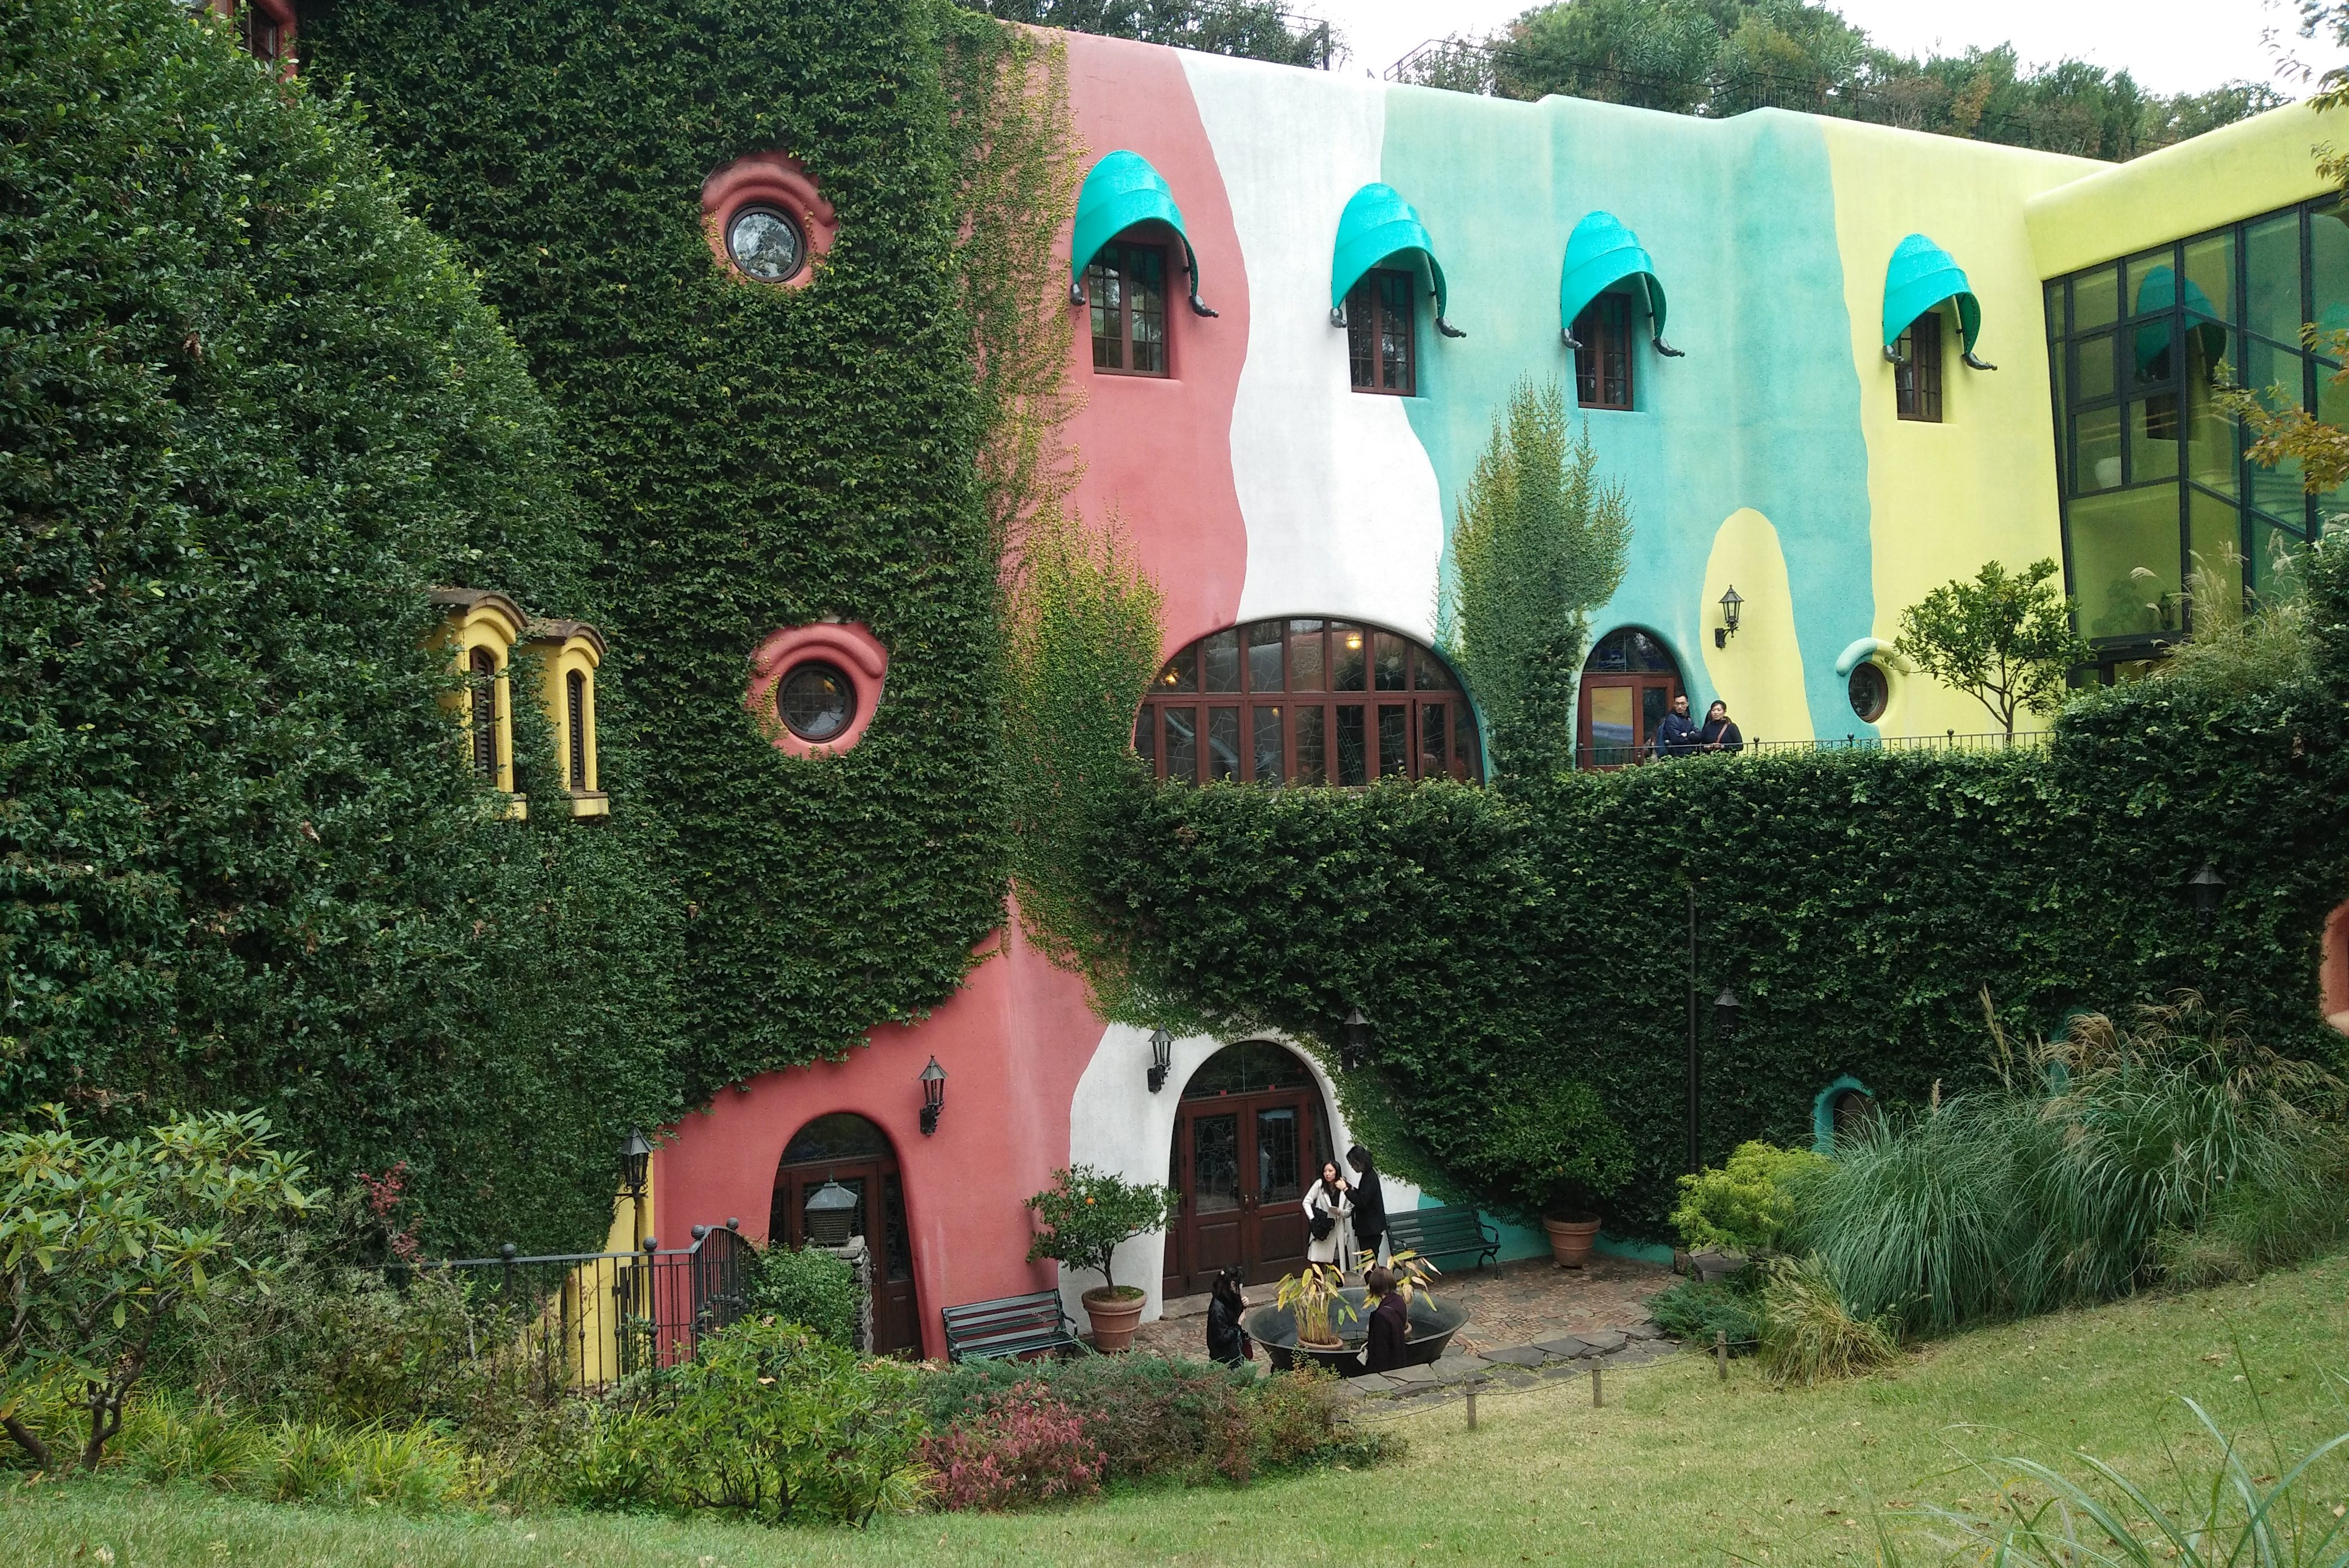 Ghibli Museum, Mitaka: A sublime world of dreams, wonder and curiosity